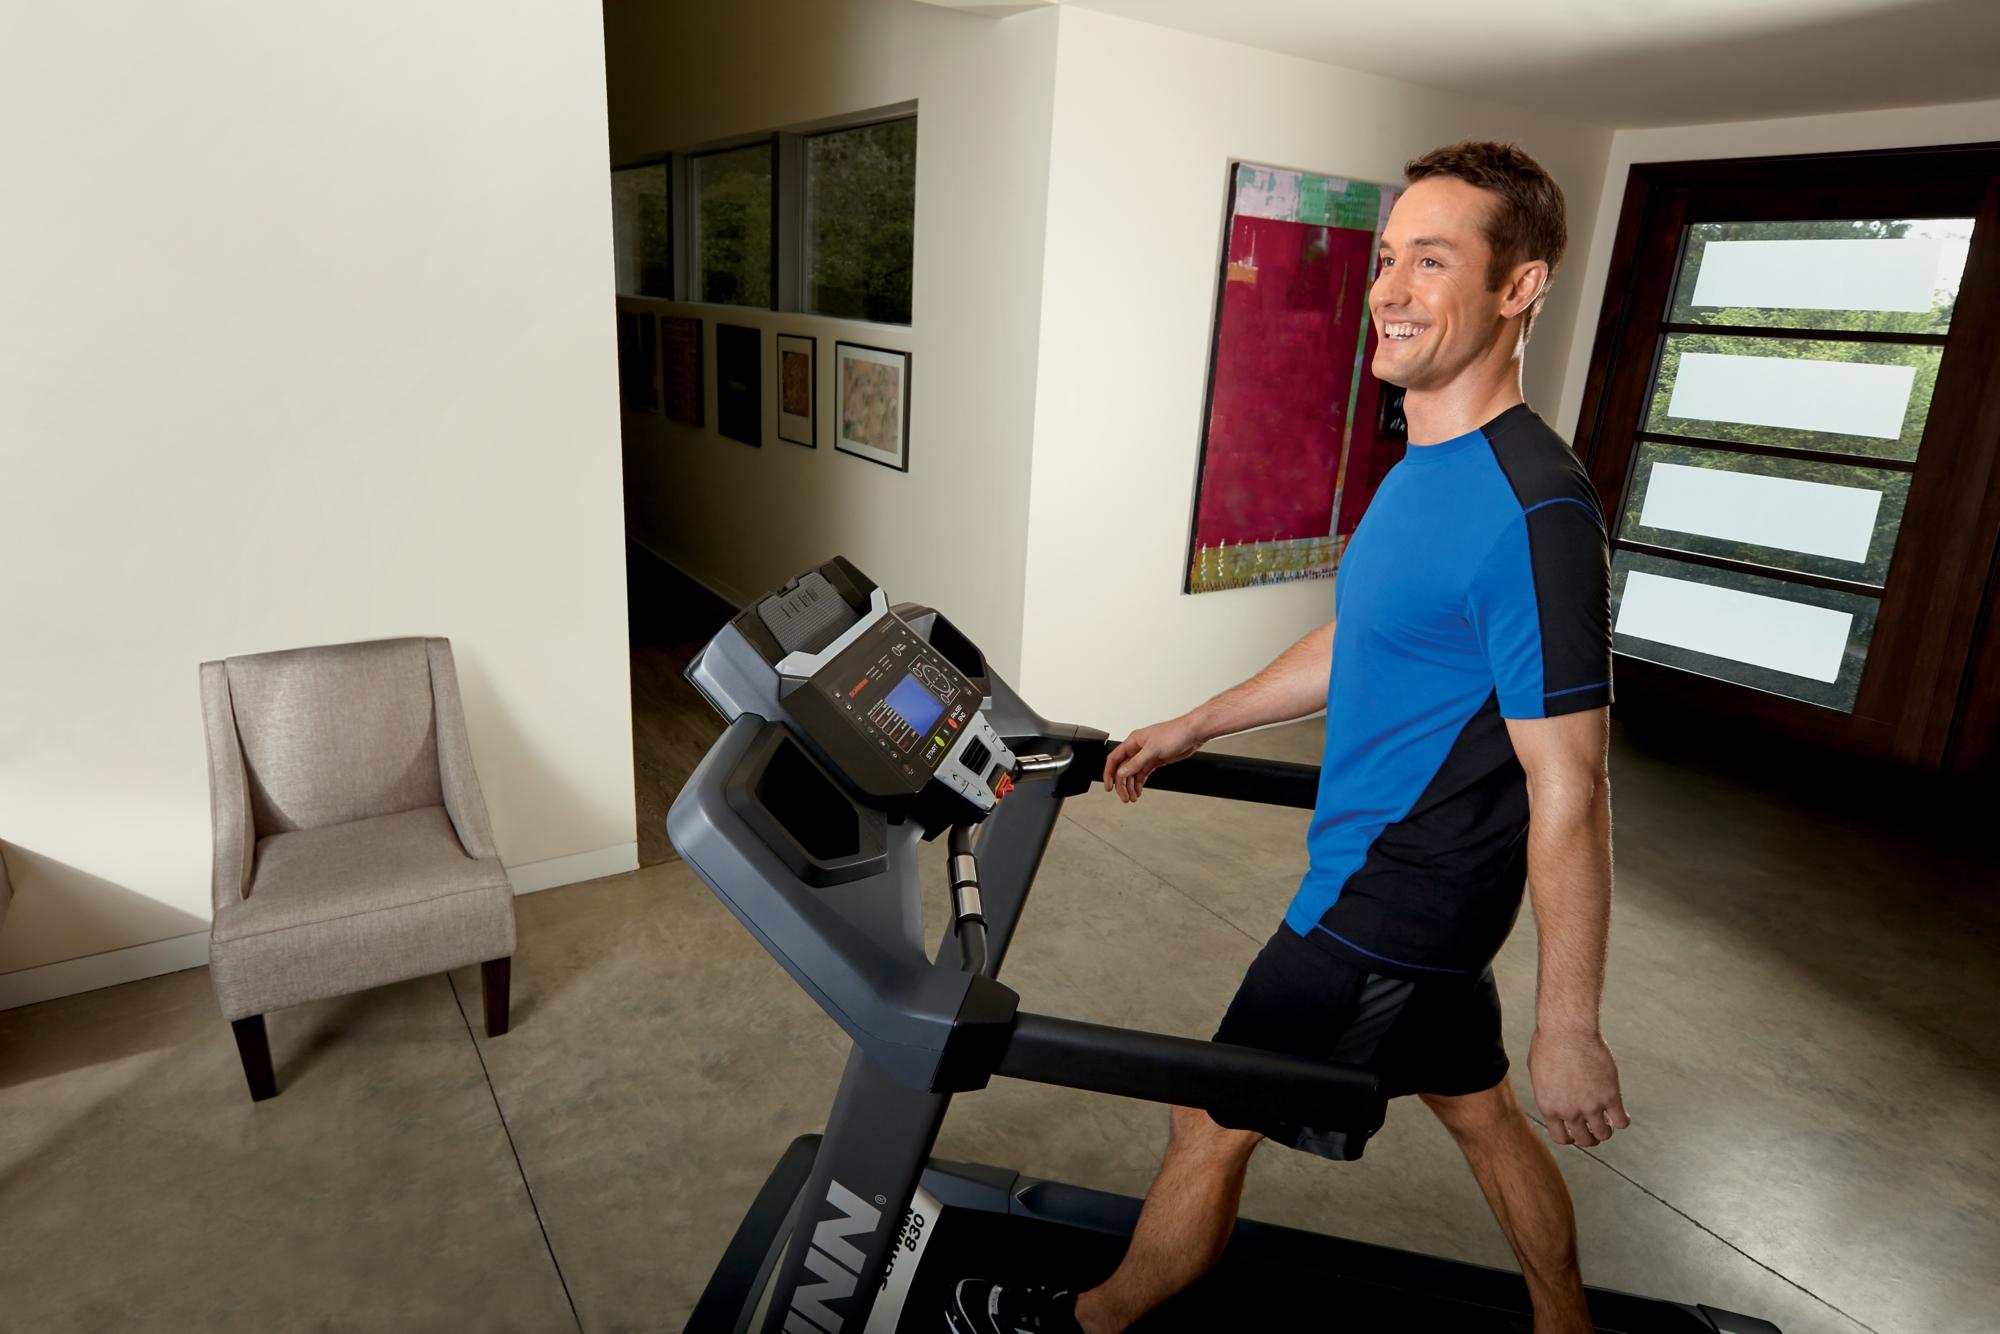 Schwinn 830 Treadmill with 2.75 CHP Motor, Multi-LCD Display and Cushioning System